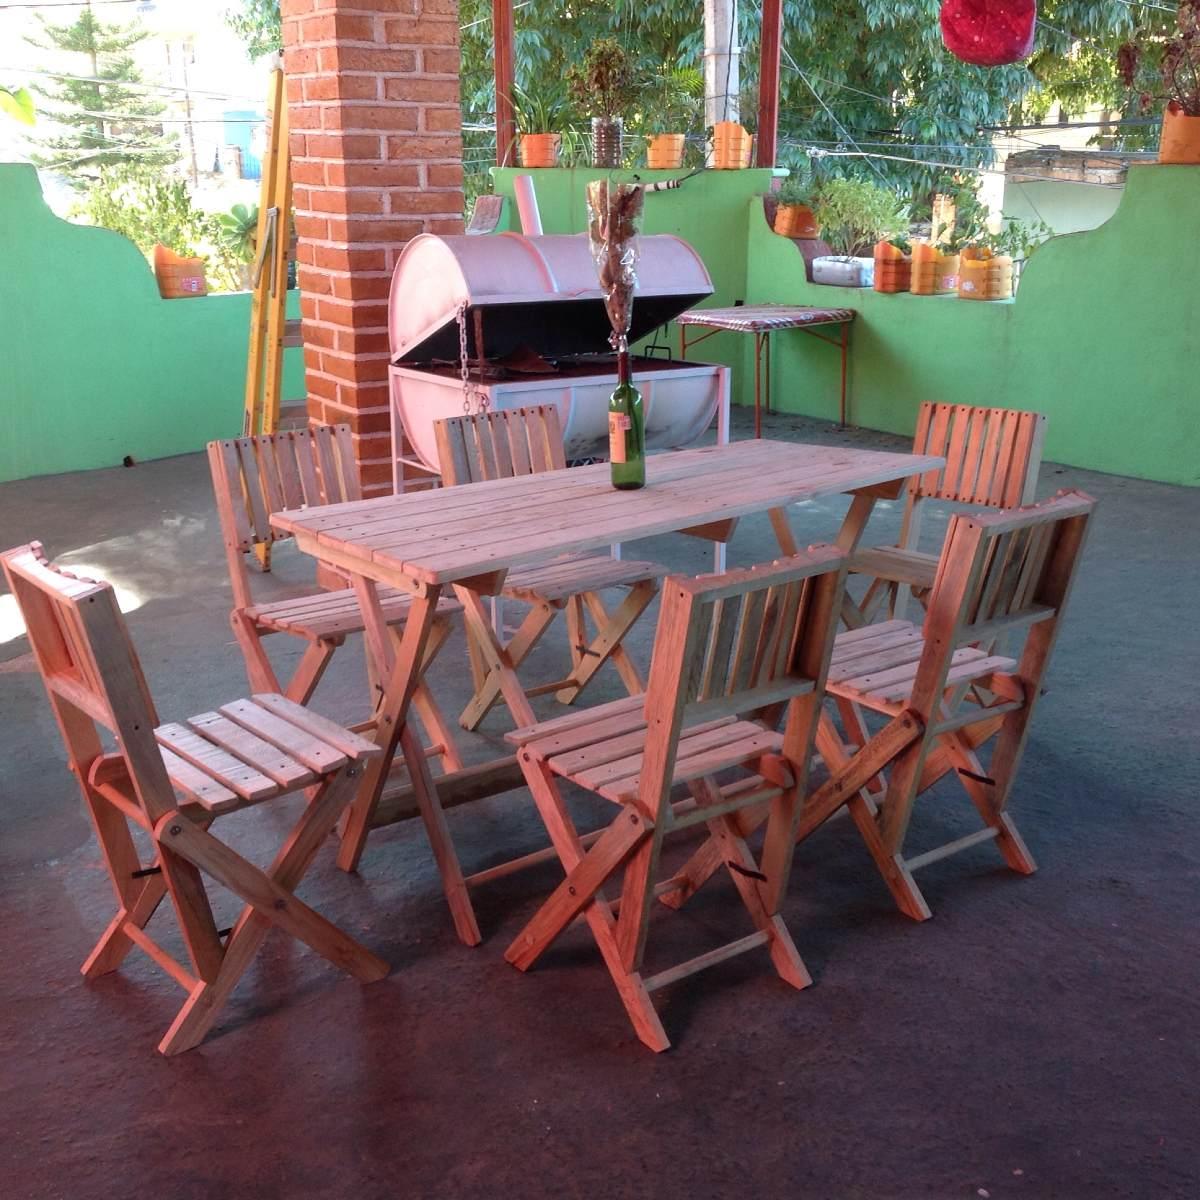 Comedor de madera con 6 sillas 2 en mercado libre for Sillas de madera precios